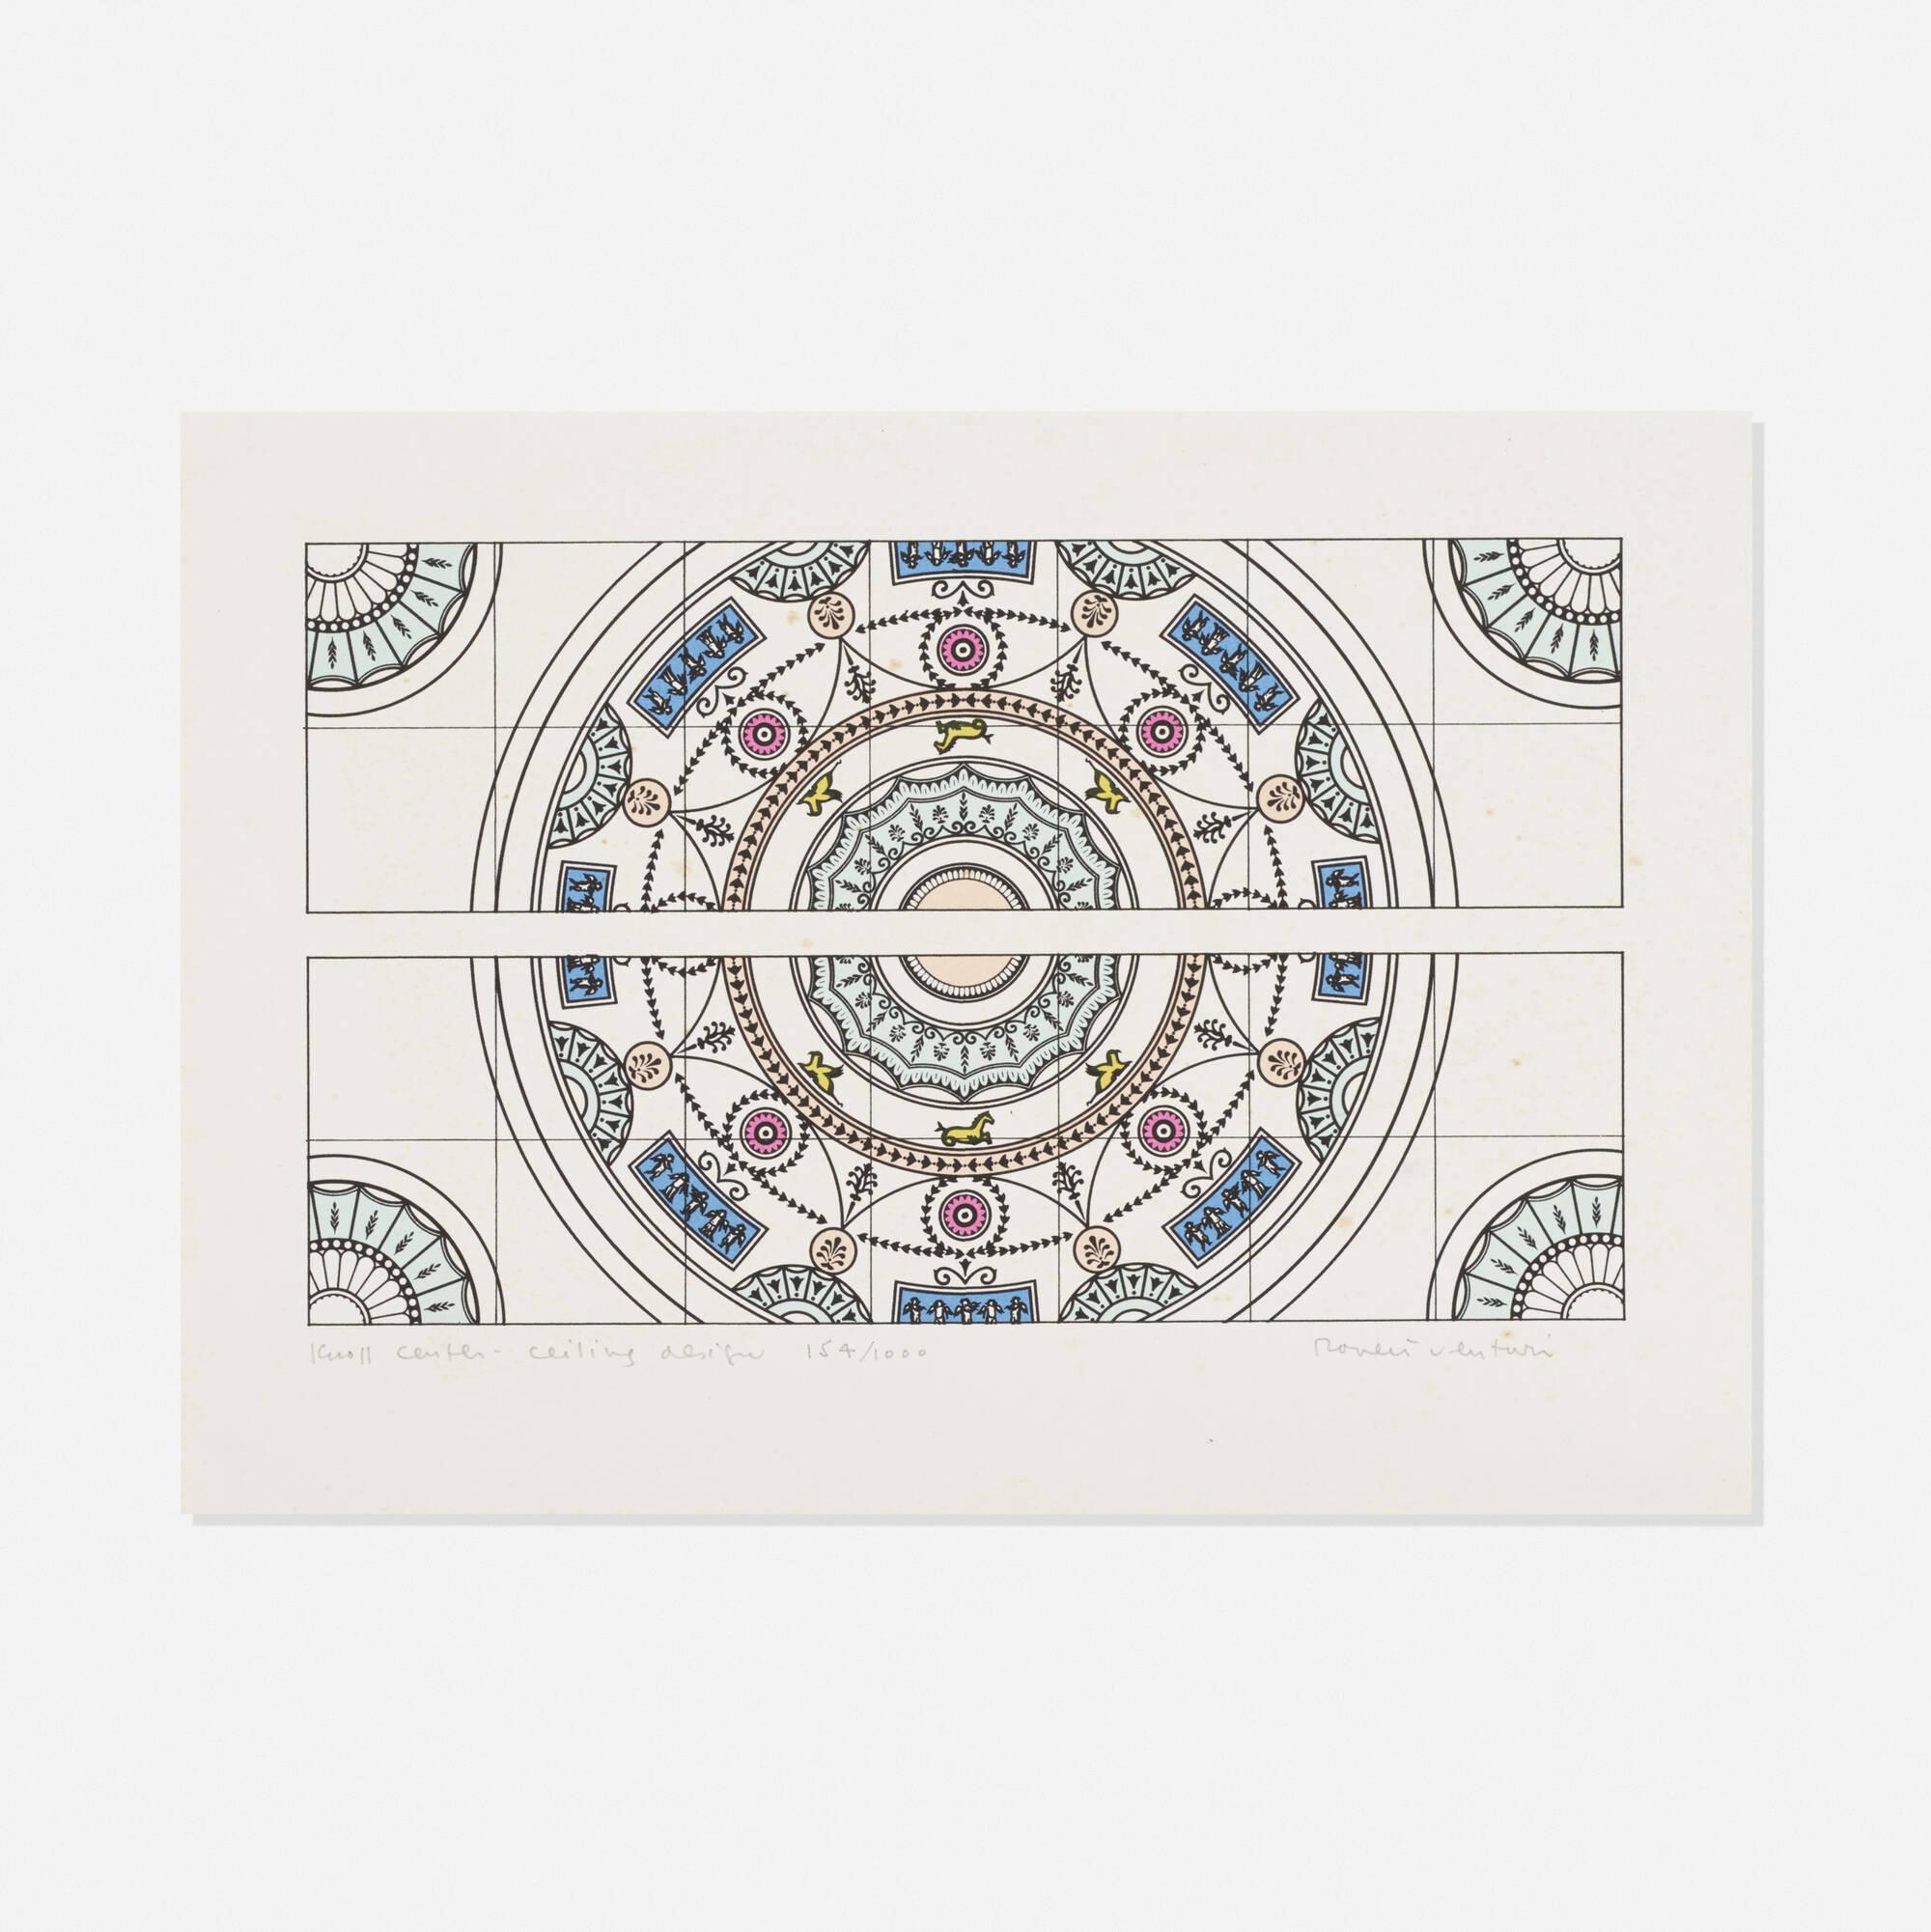 774: Robert Venturi / Knoll Center - Ceiling Design (1 of 1)